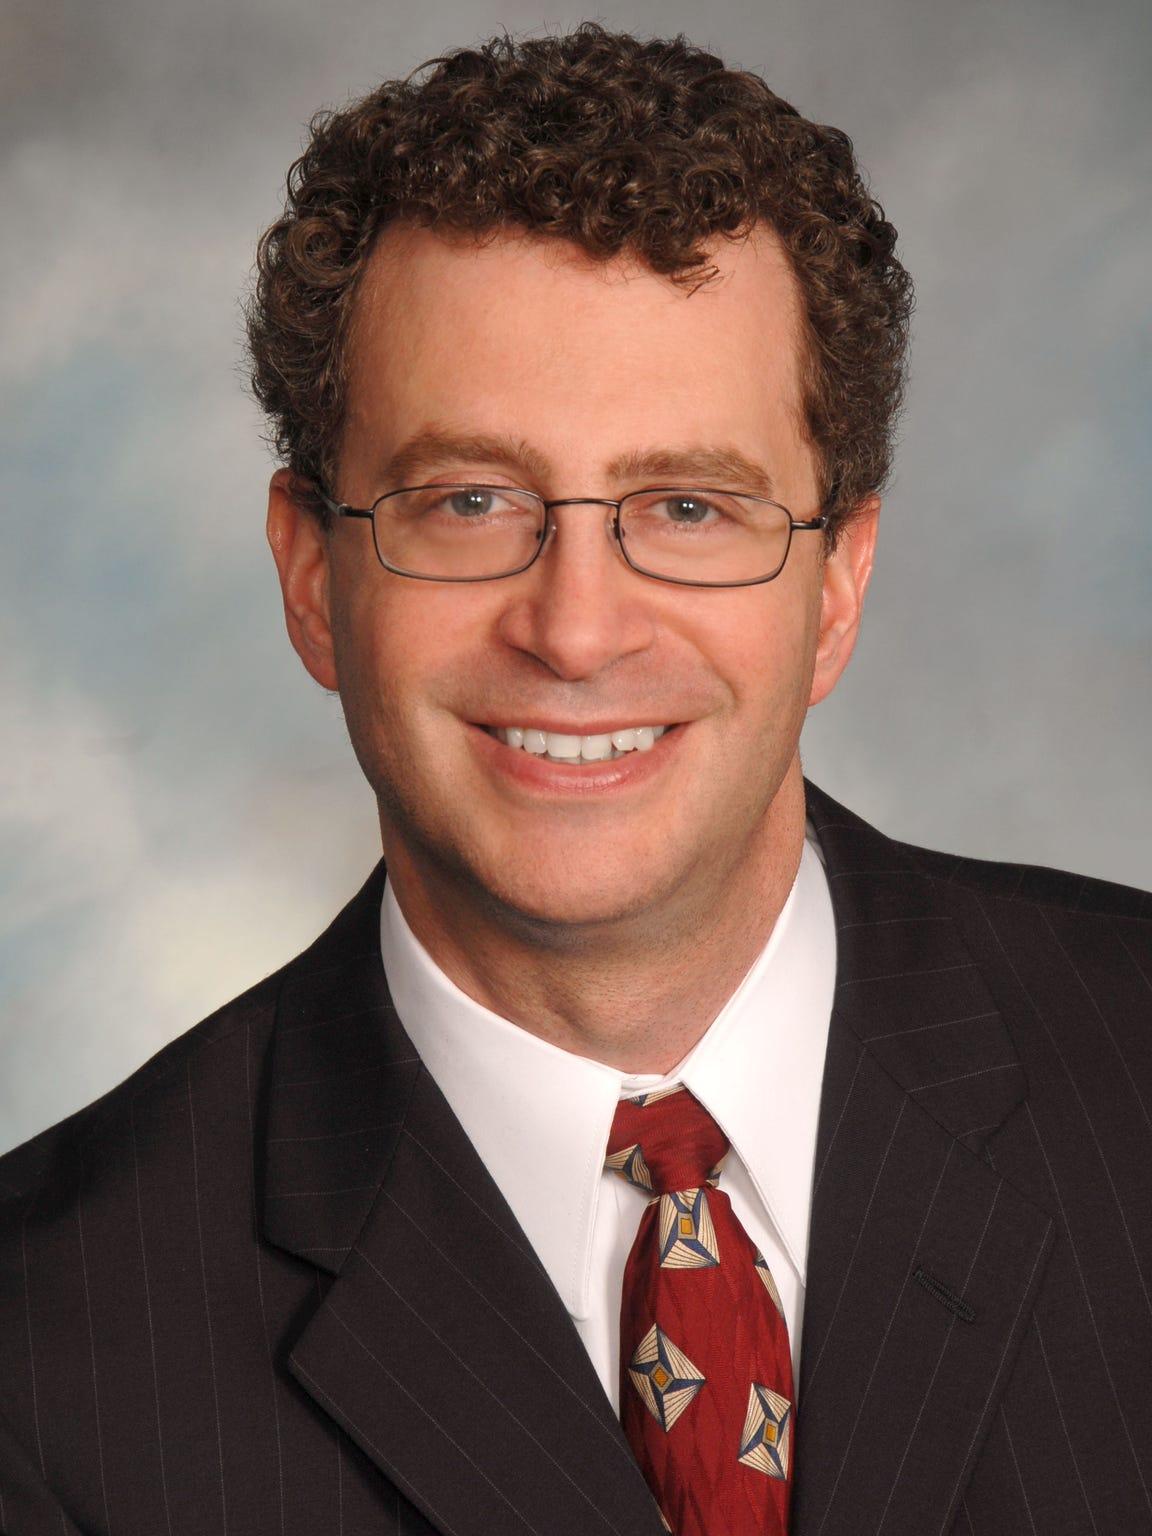 Alex Geisinger, professor of economics at Drexel University